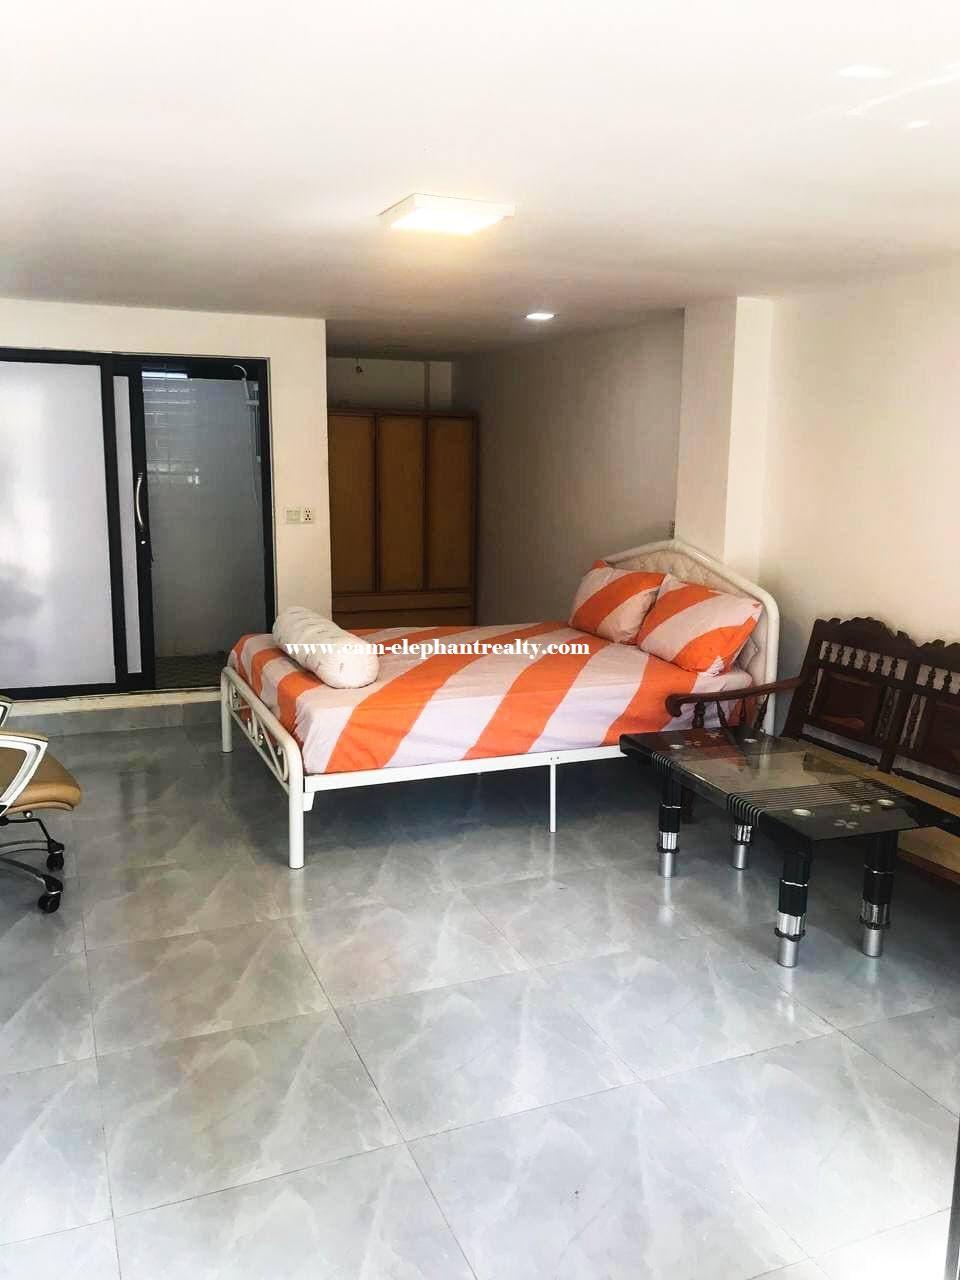 Apartment for Rent (Studio room; BKK1 area)